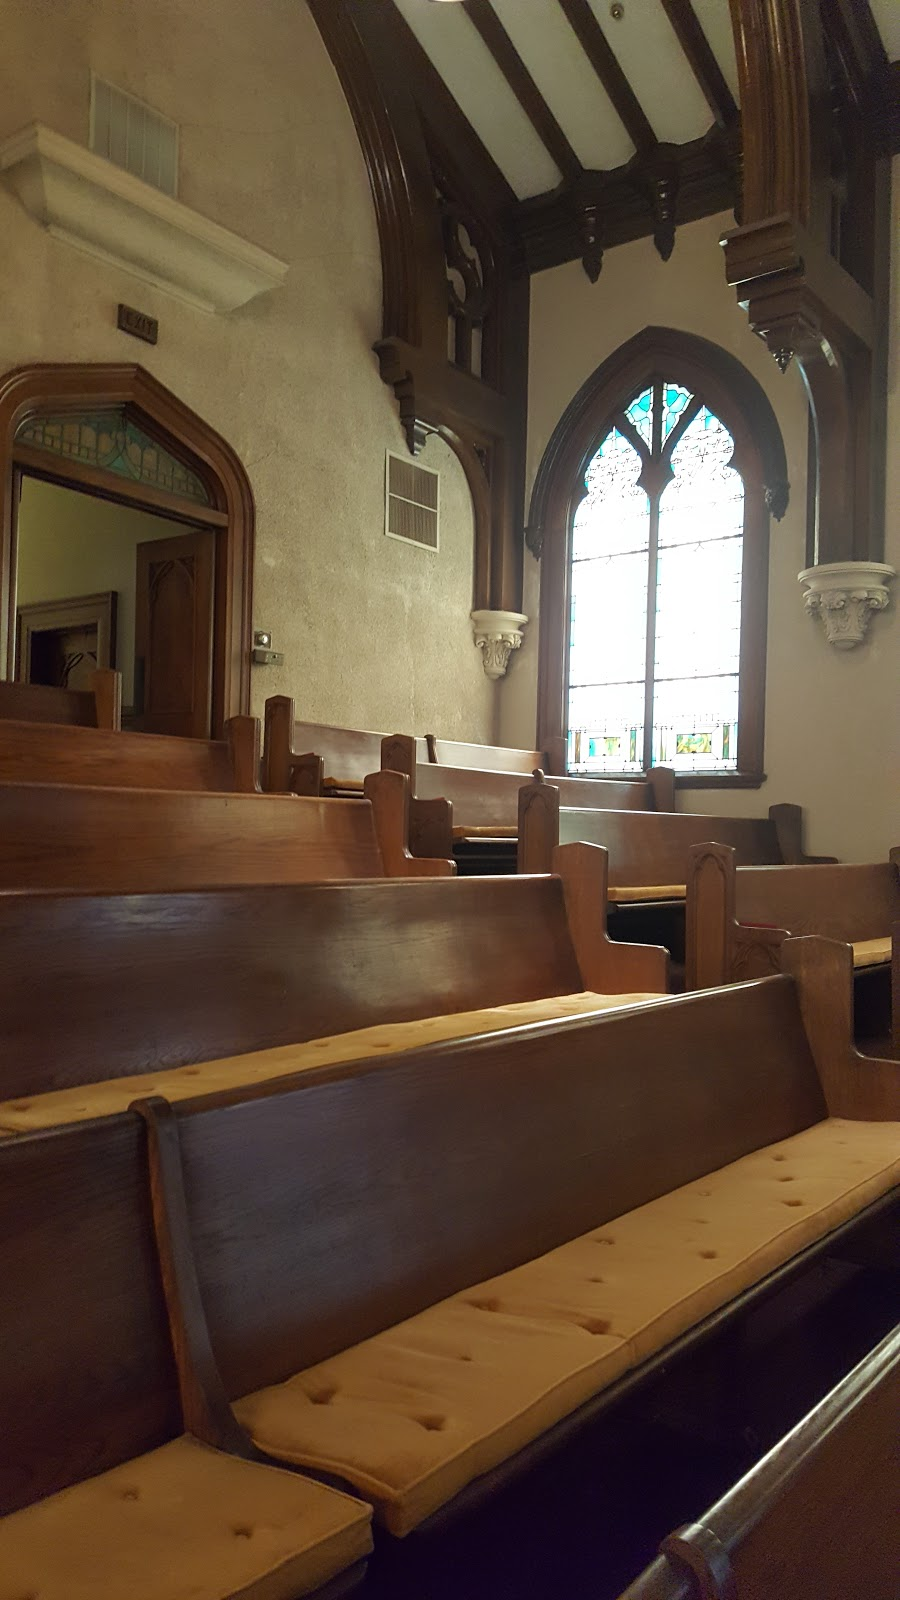 Pilgrim Congregational Church - church  | Photo 9 of 10 | Address: 600 N Garey Ave, Pomona, CA 91767, USA | Phone: (909) 622-1373